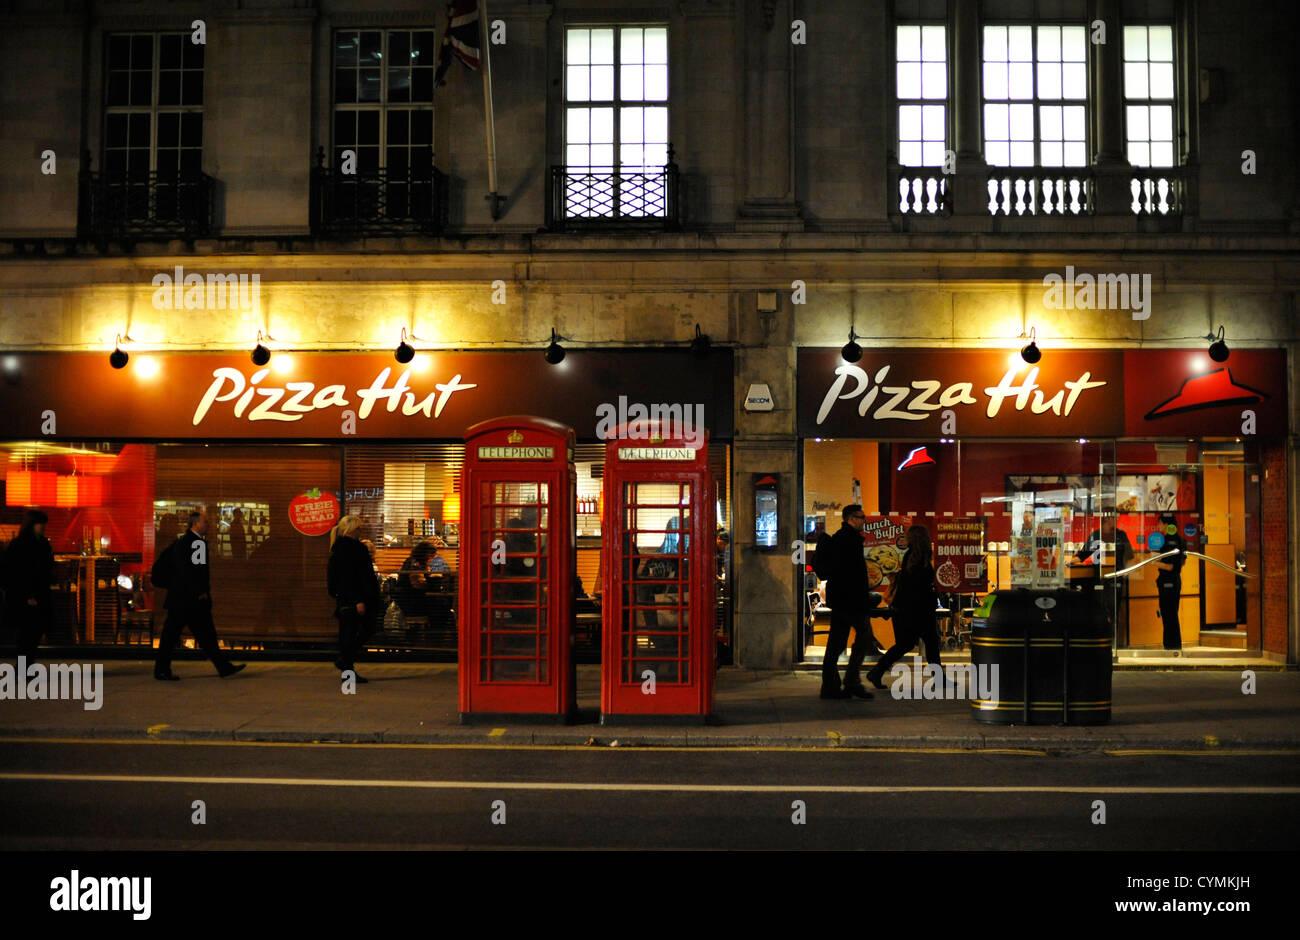 Pizza Hut London Stock Photo 51470905 Alamy